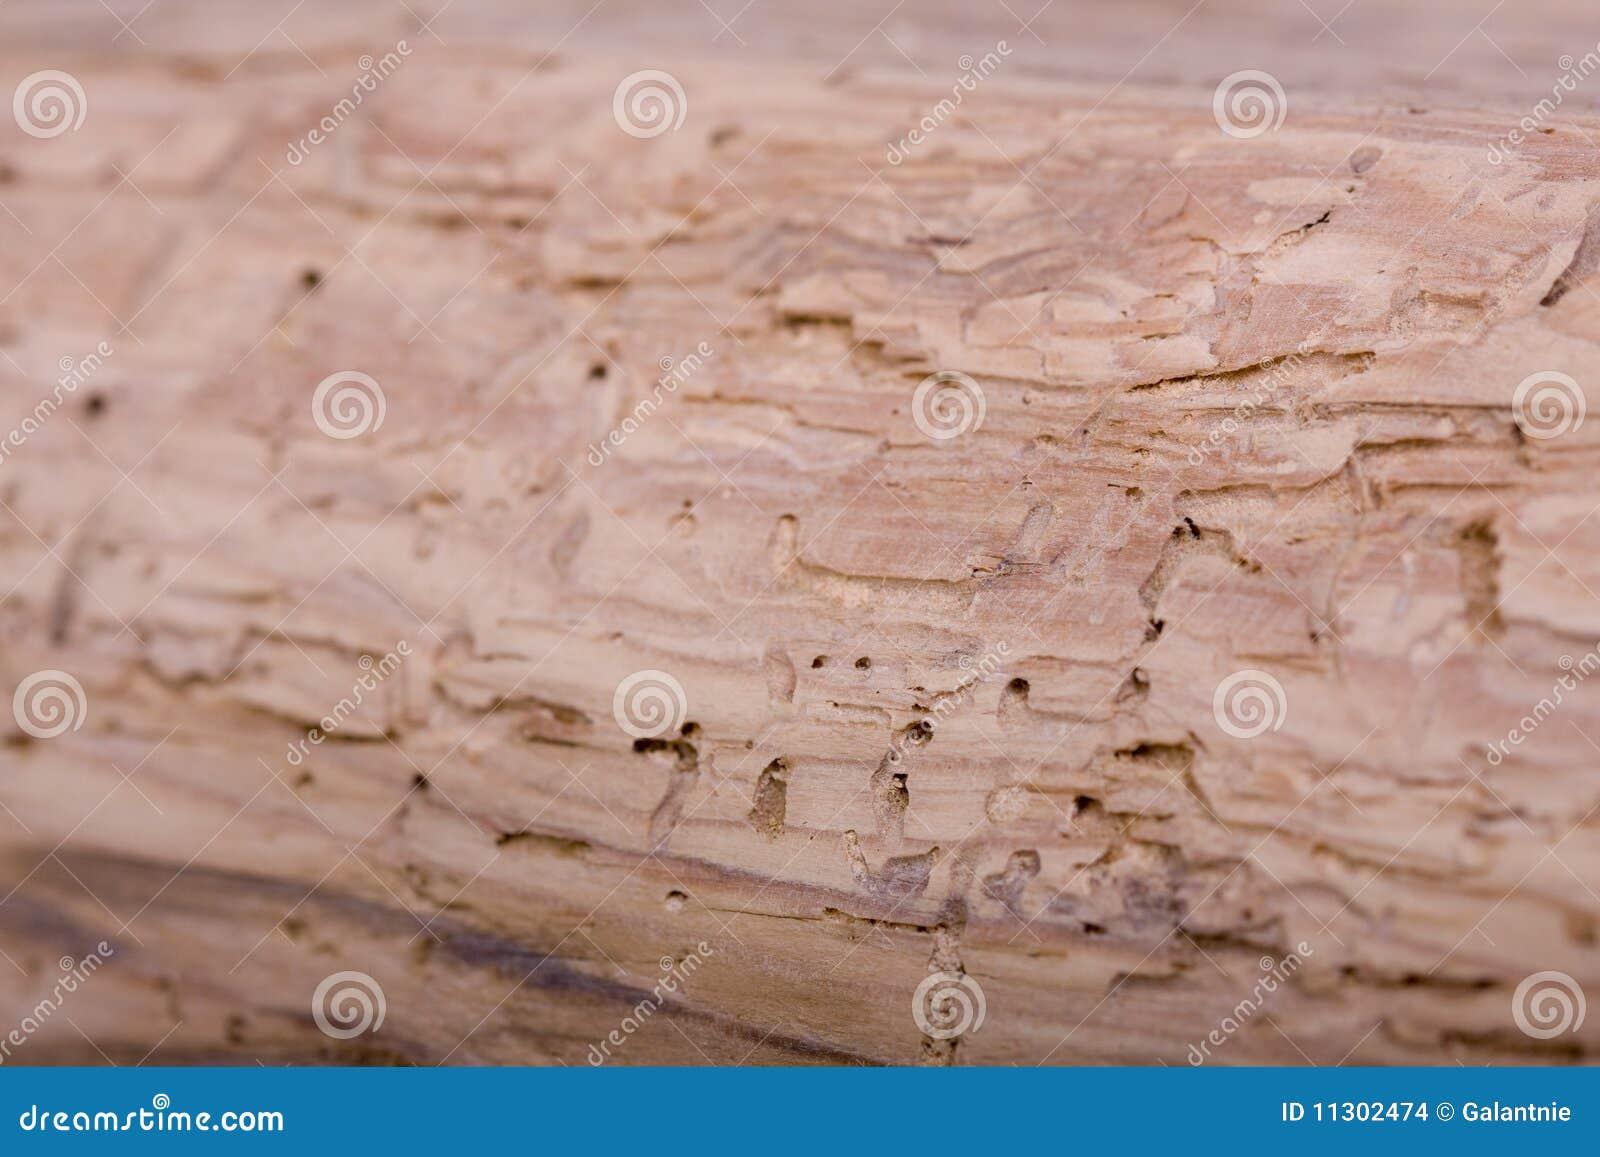 Schadenholz